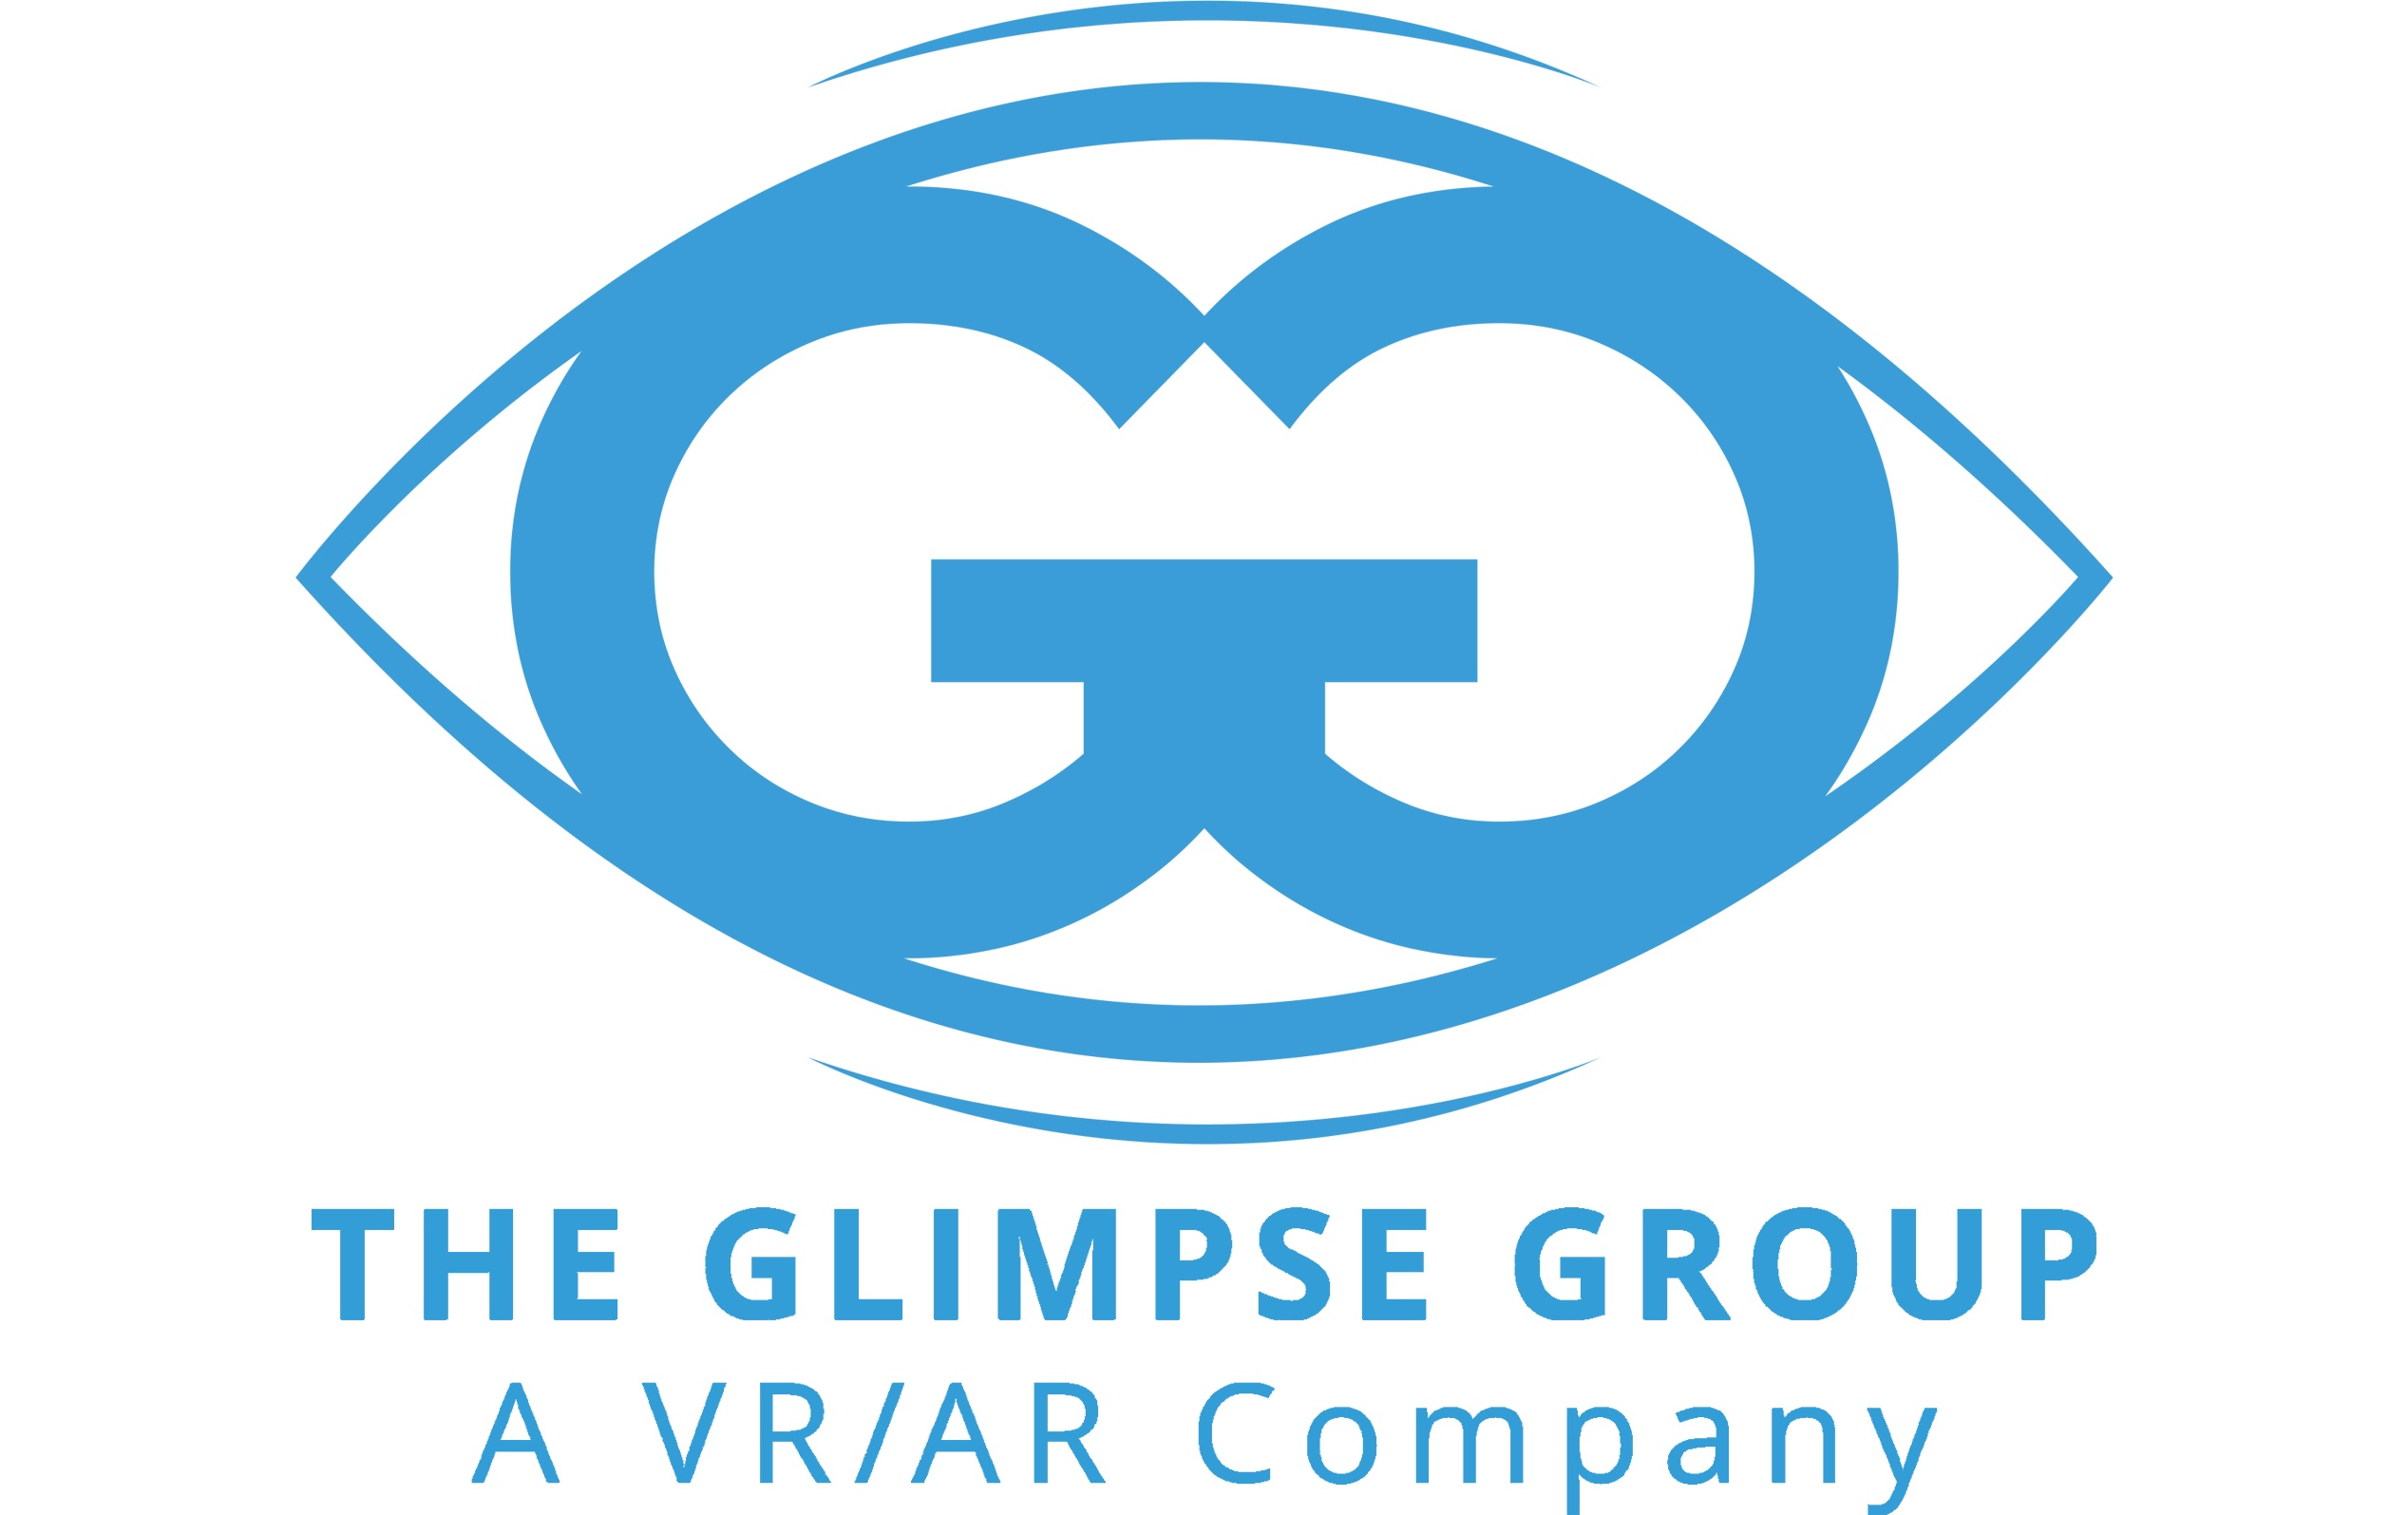 The Glimpse Group, Inc.